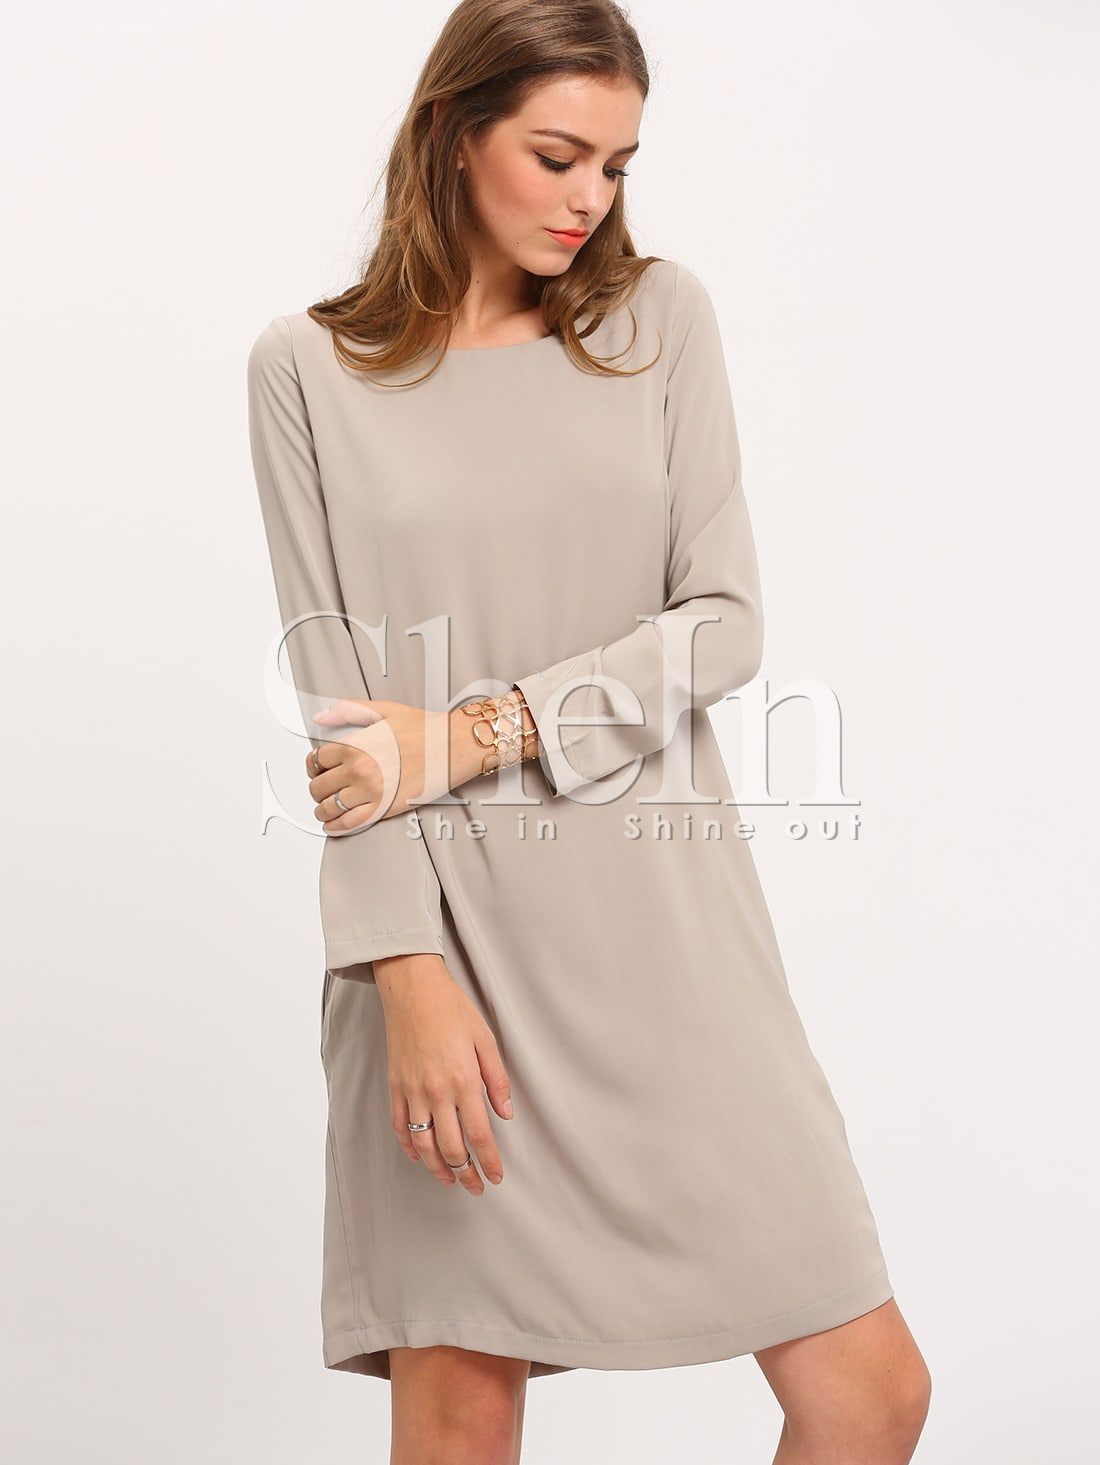 Grey Long Sleeve Round Neck Dress dress151021507